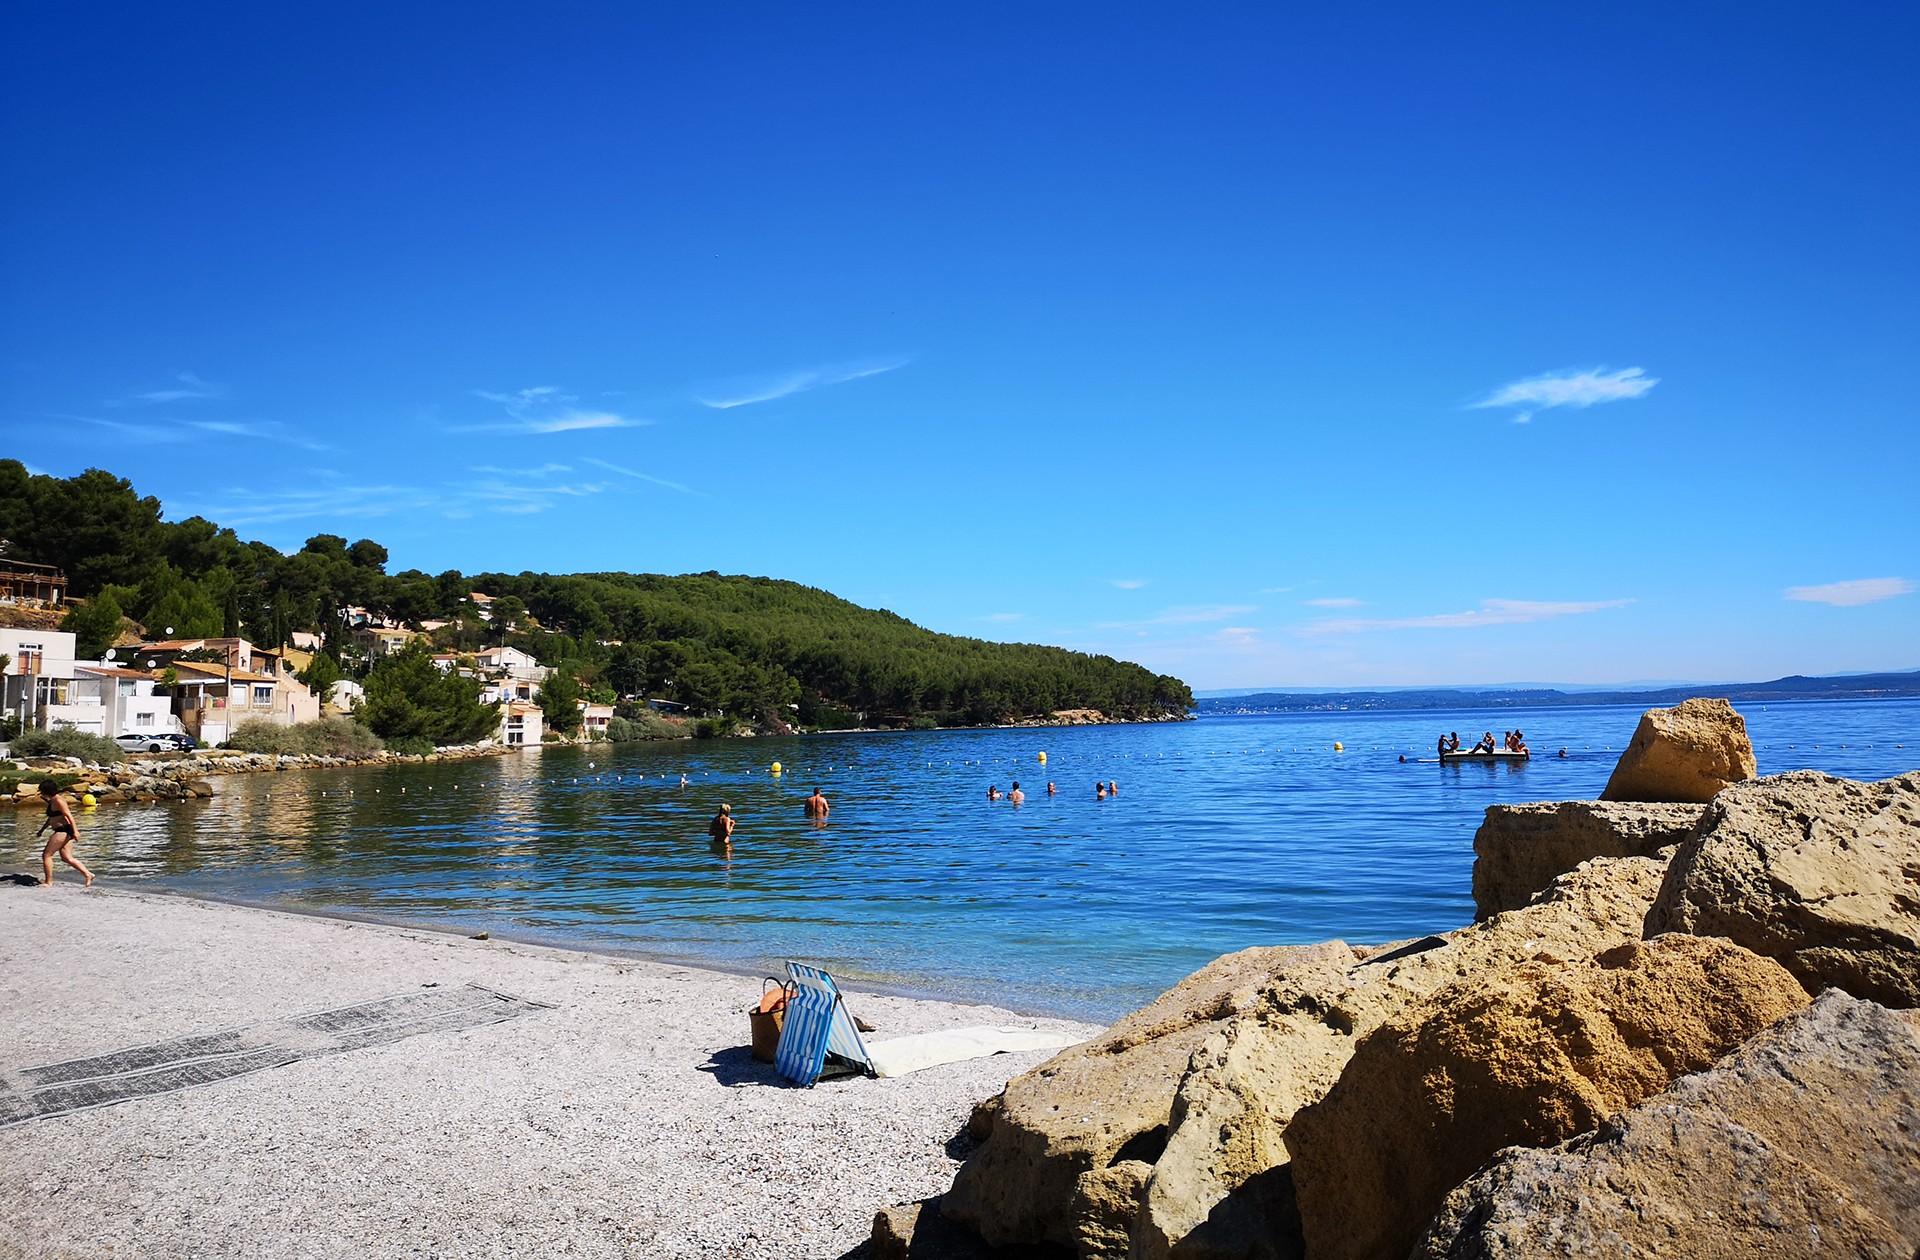 Les plages de l'étang de Berre d'Istres